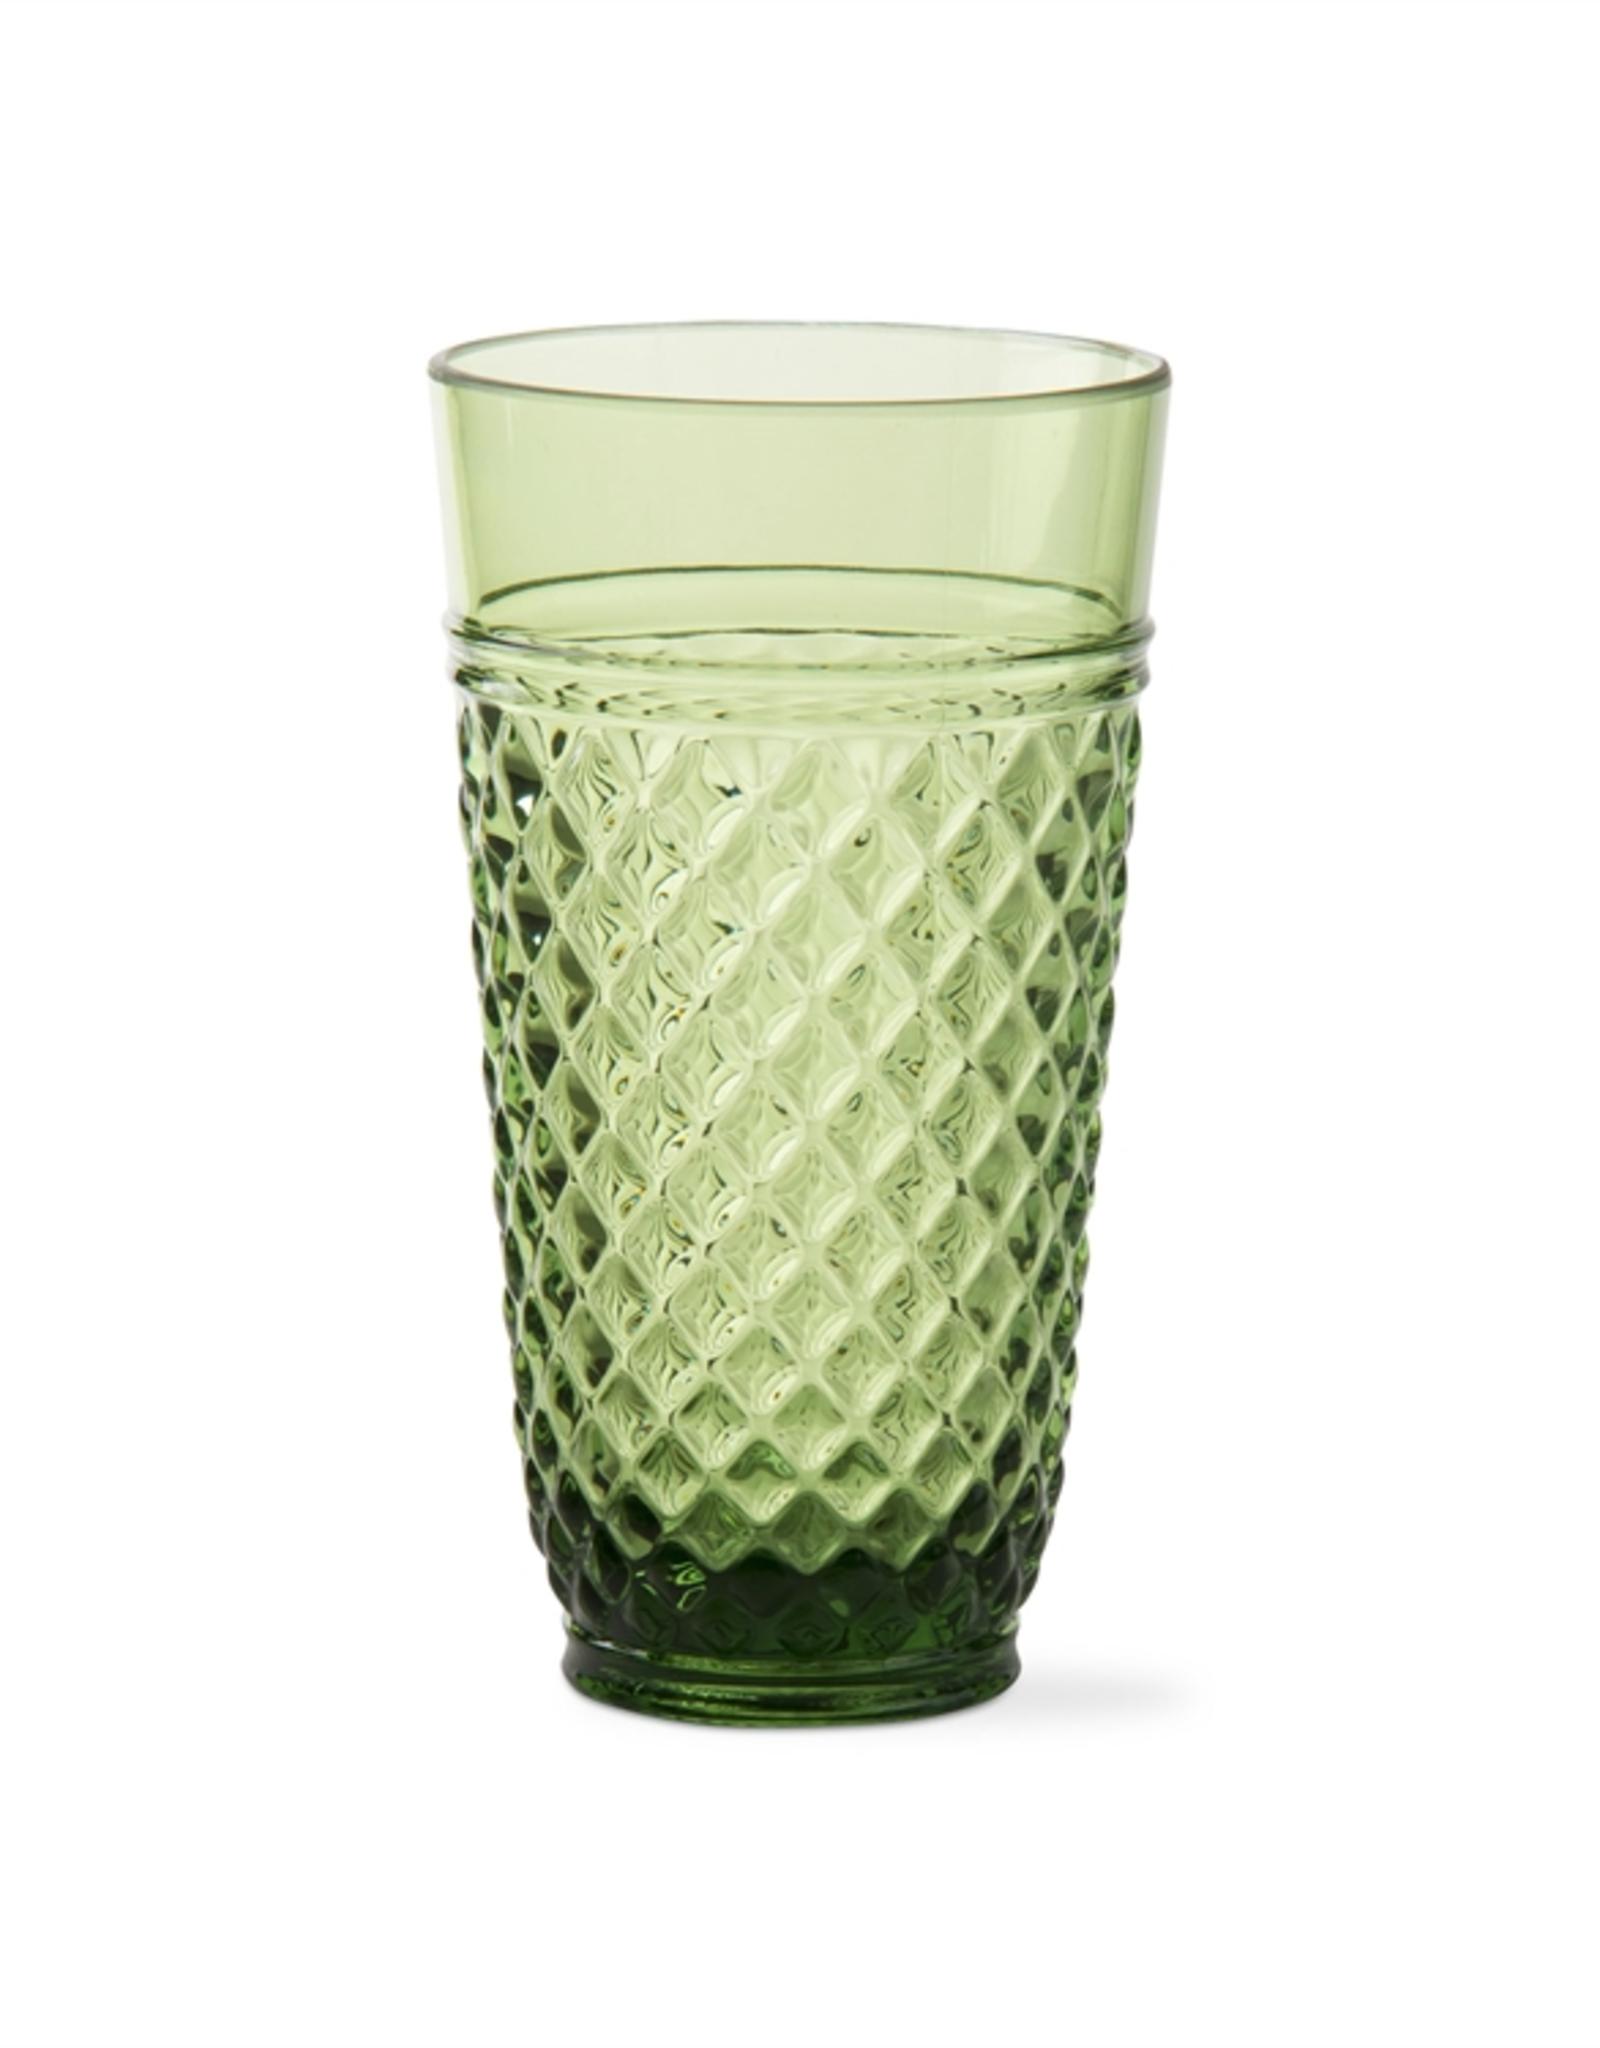 Tag Drinkware, Tumbler, Green